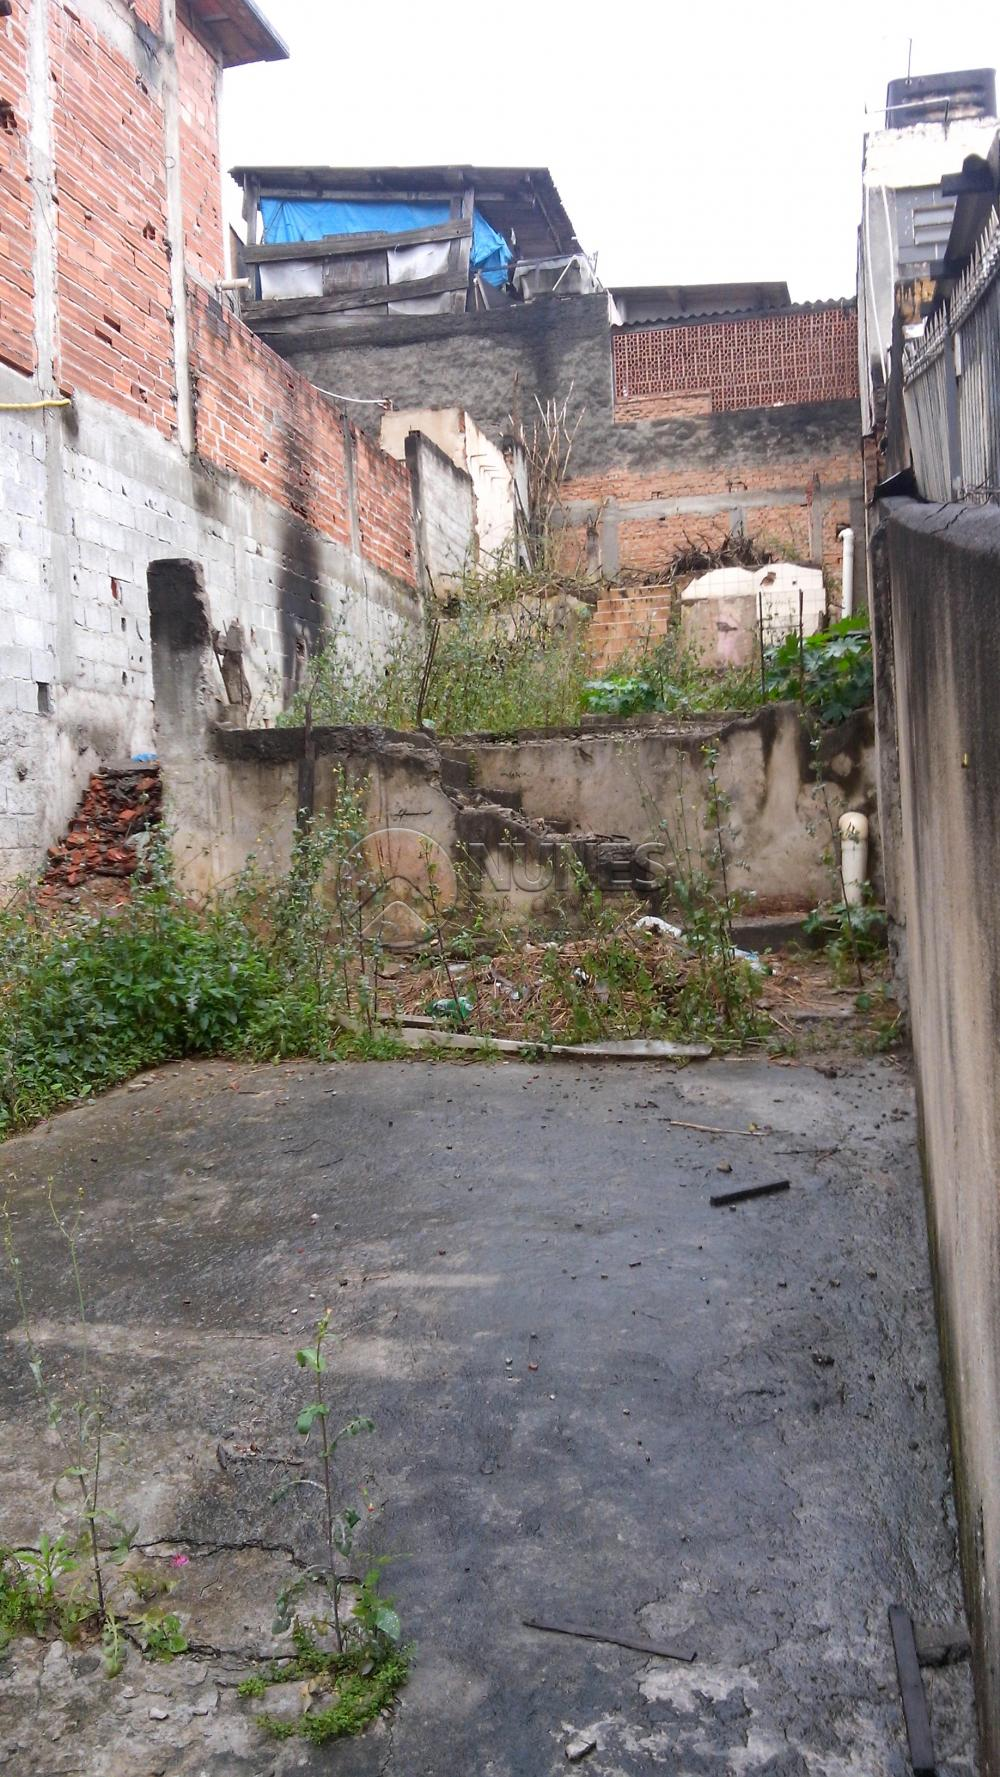 Lote / Terreno Residencial à venda em Jardim Santo Antoninho, Osasco - SP